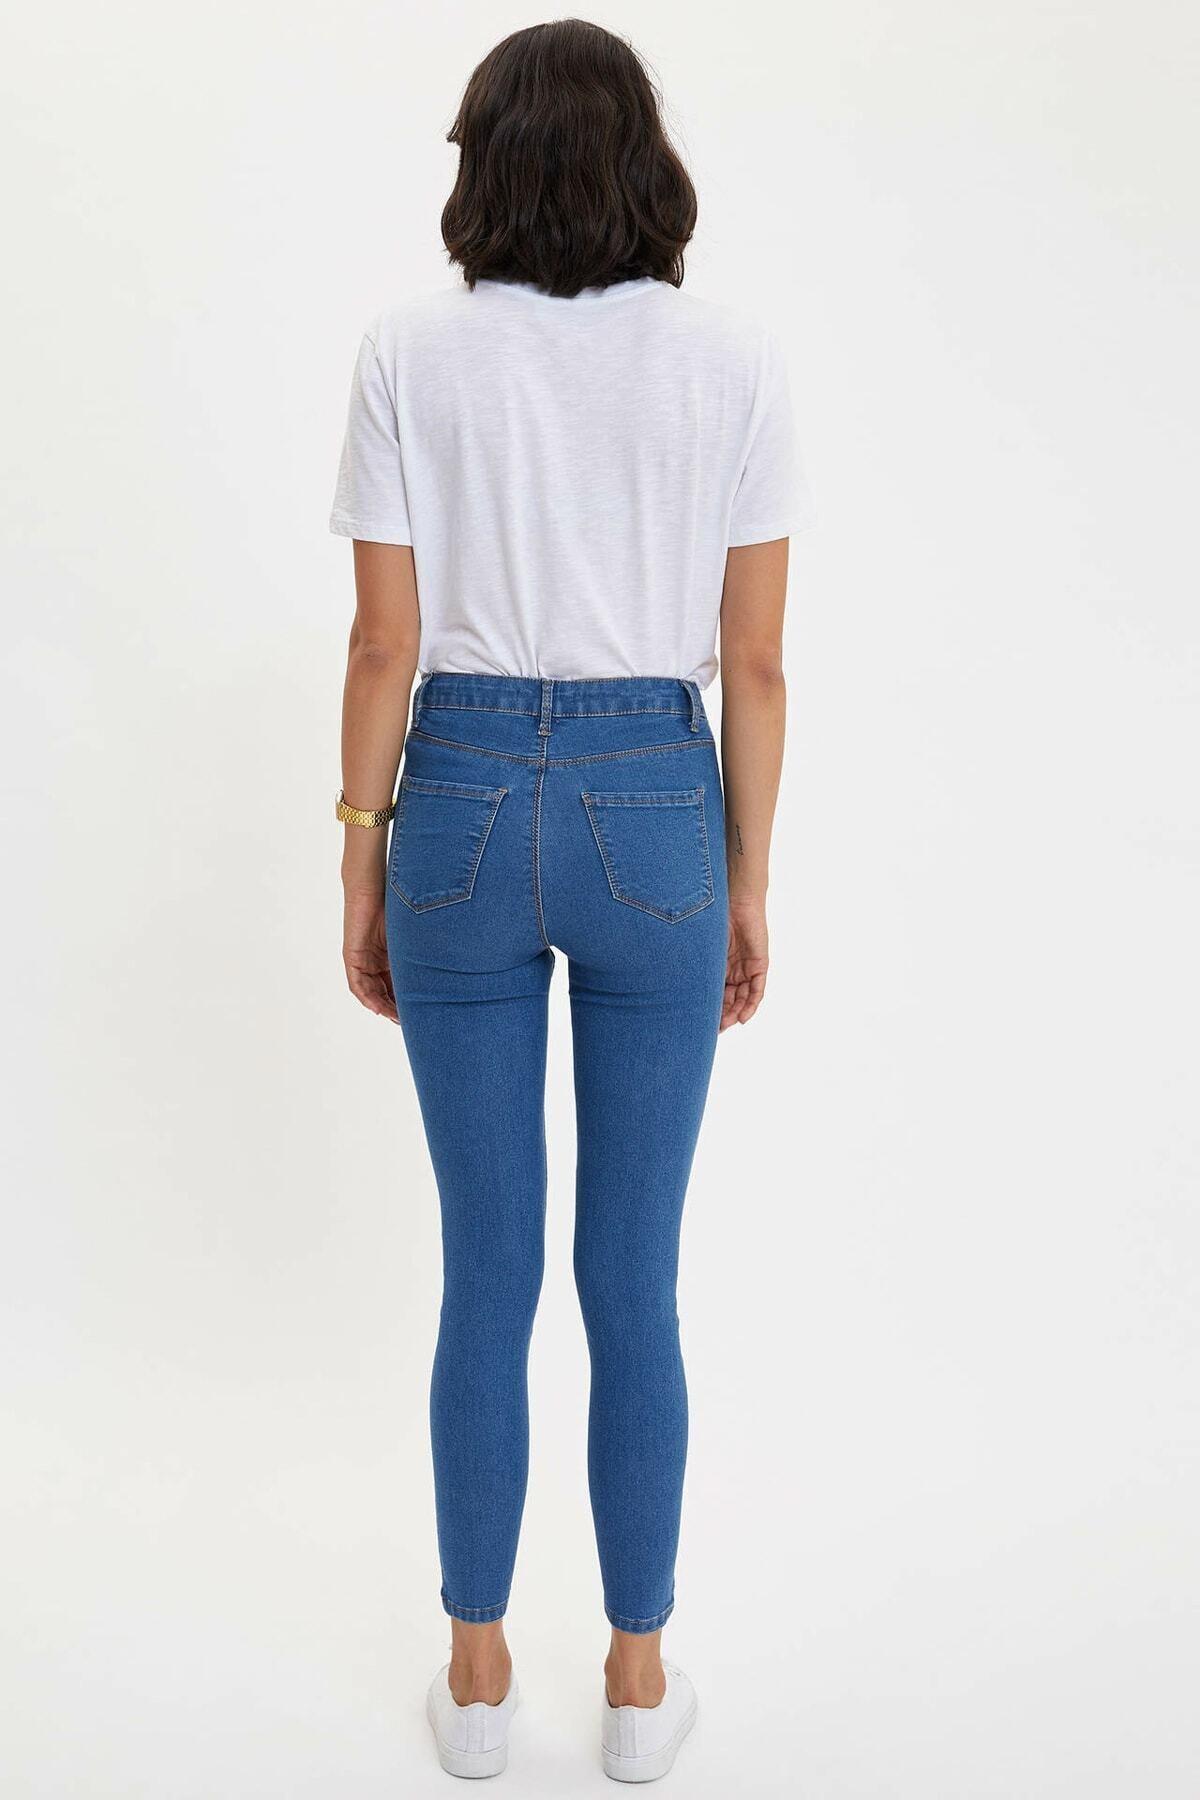 DeFacto Kadın Mavi Kot Anna Yüksek Bel Super Skinny Jean Pantolon 2